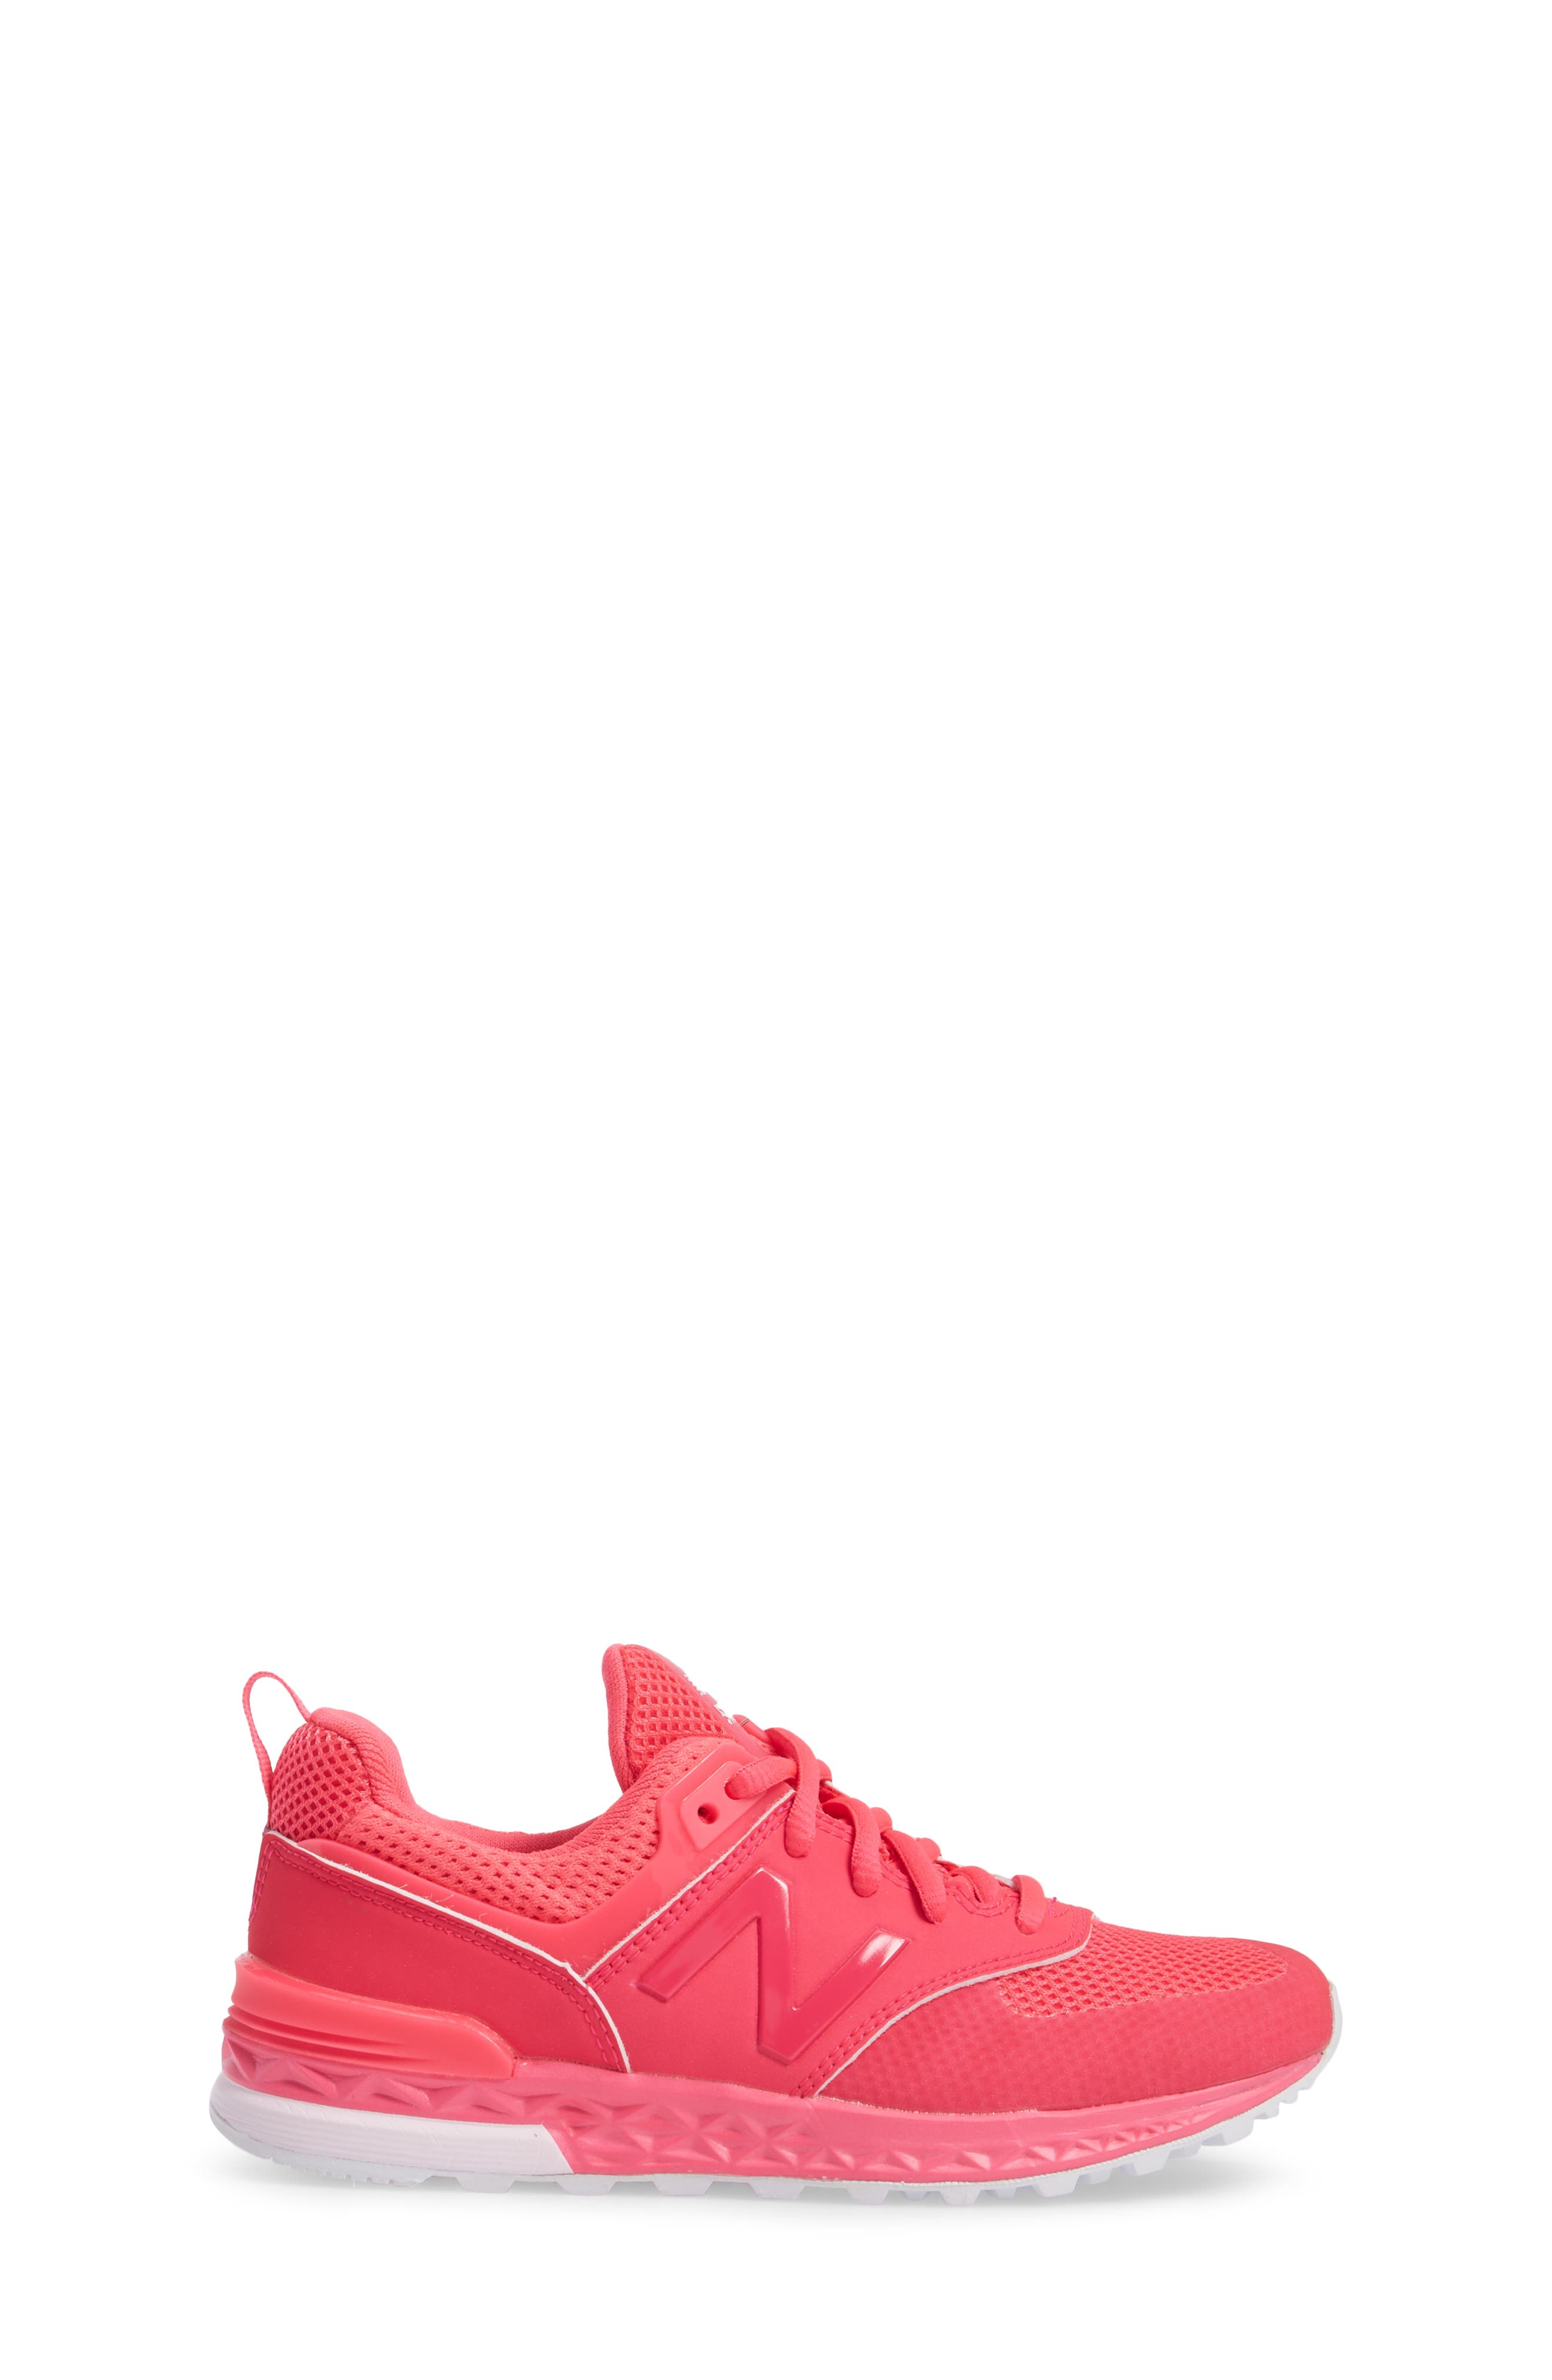 Alternate Image 3  - New Balance 574 v2 Sport Sneaker (Baby, Walker, Toddler, Little Kid & Big Kid)